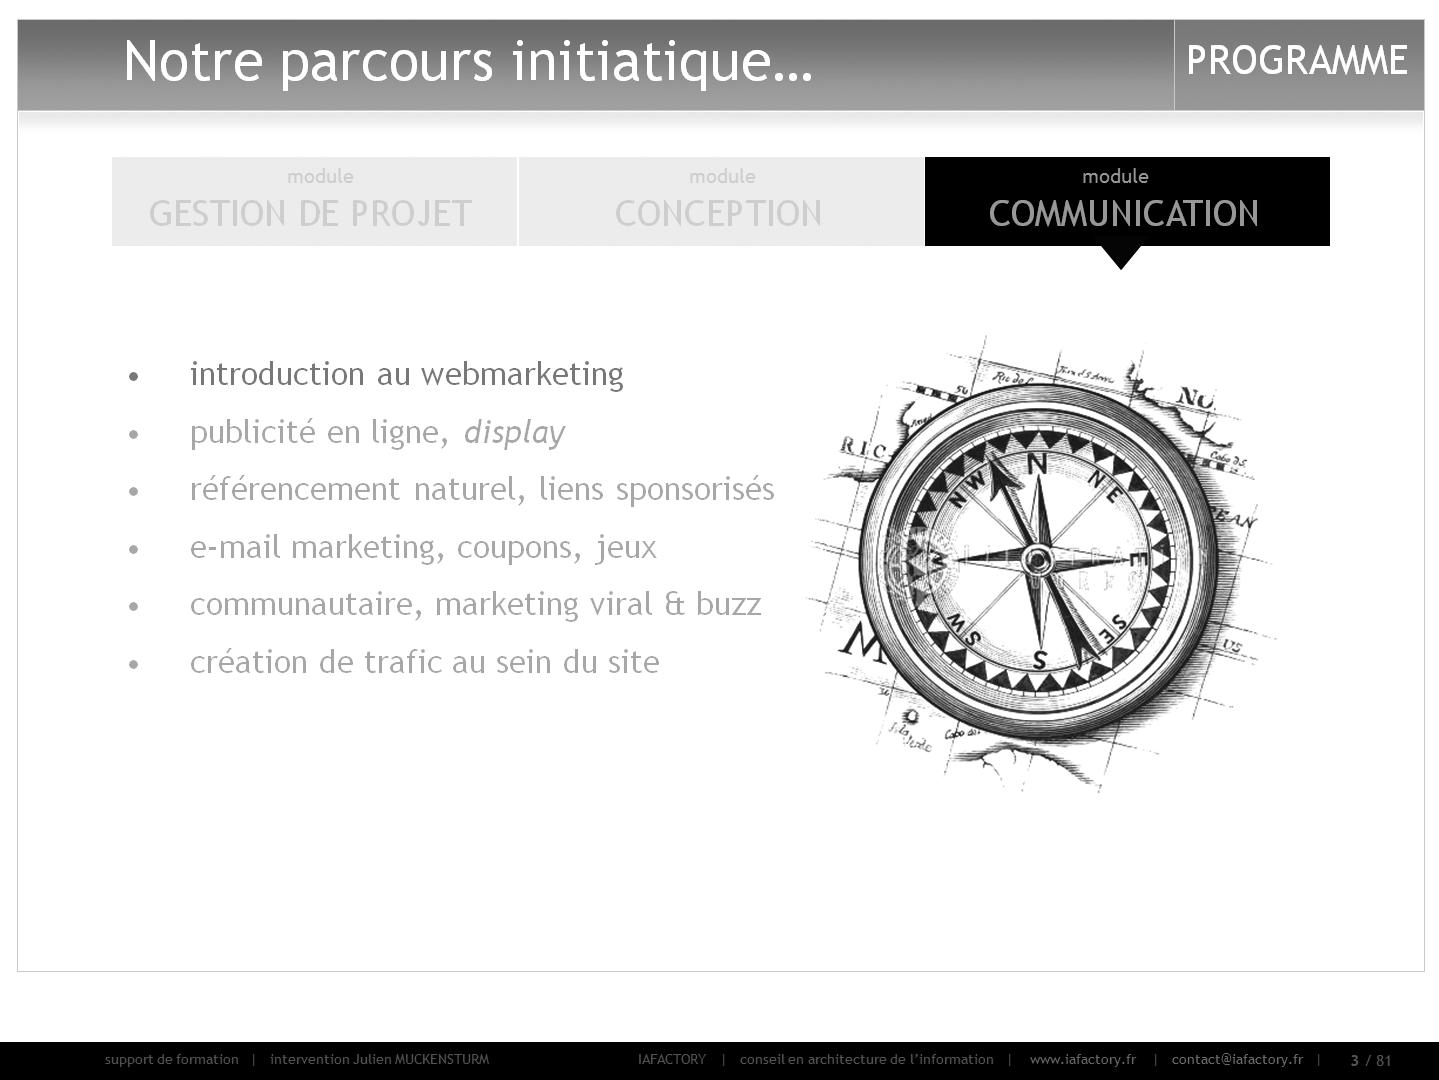 formation universitaire en webmarketing : intro (programme)